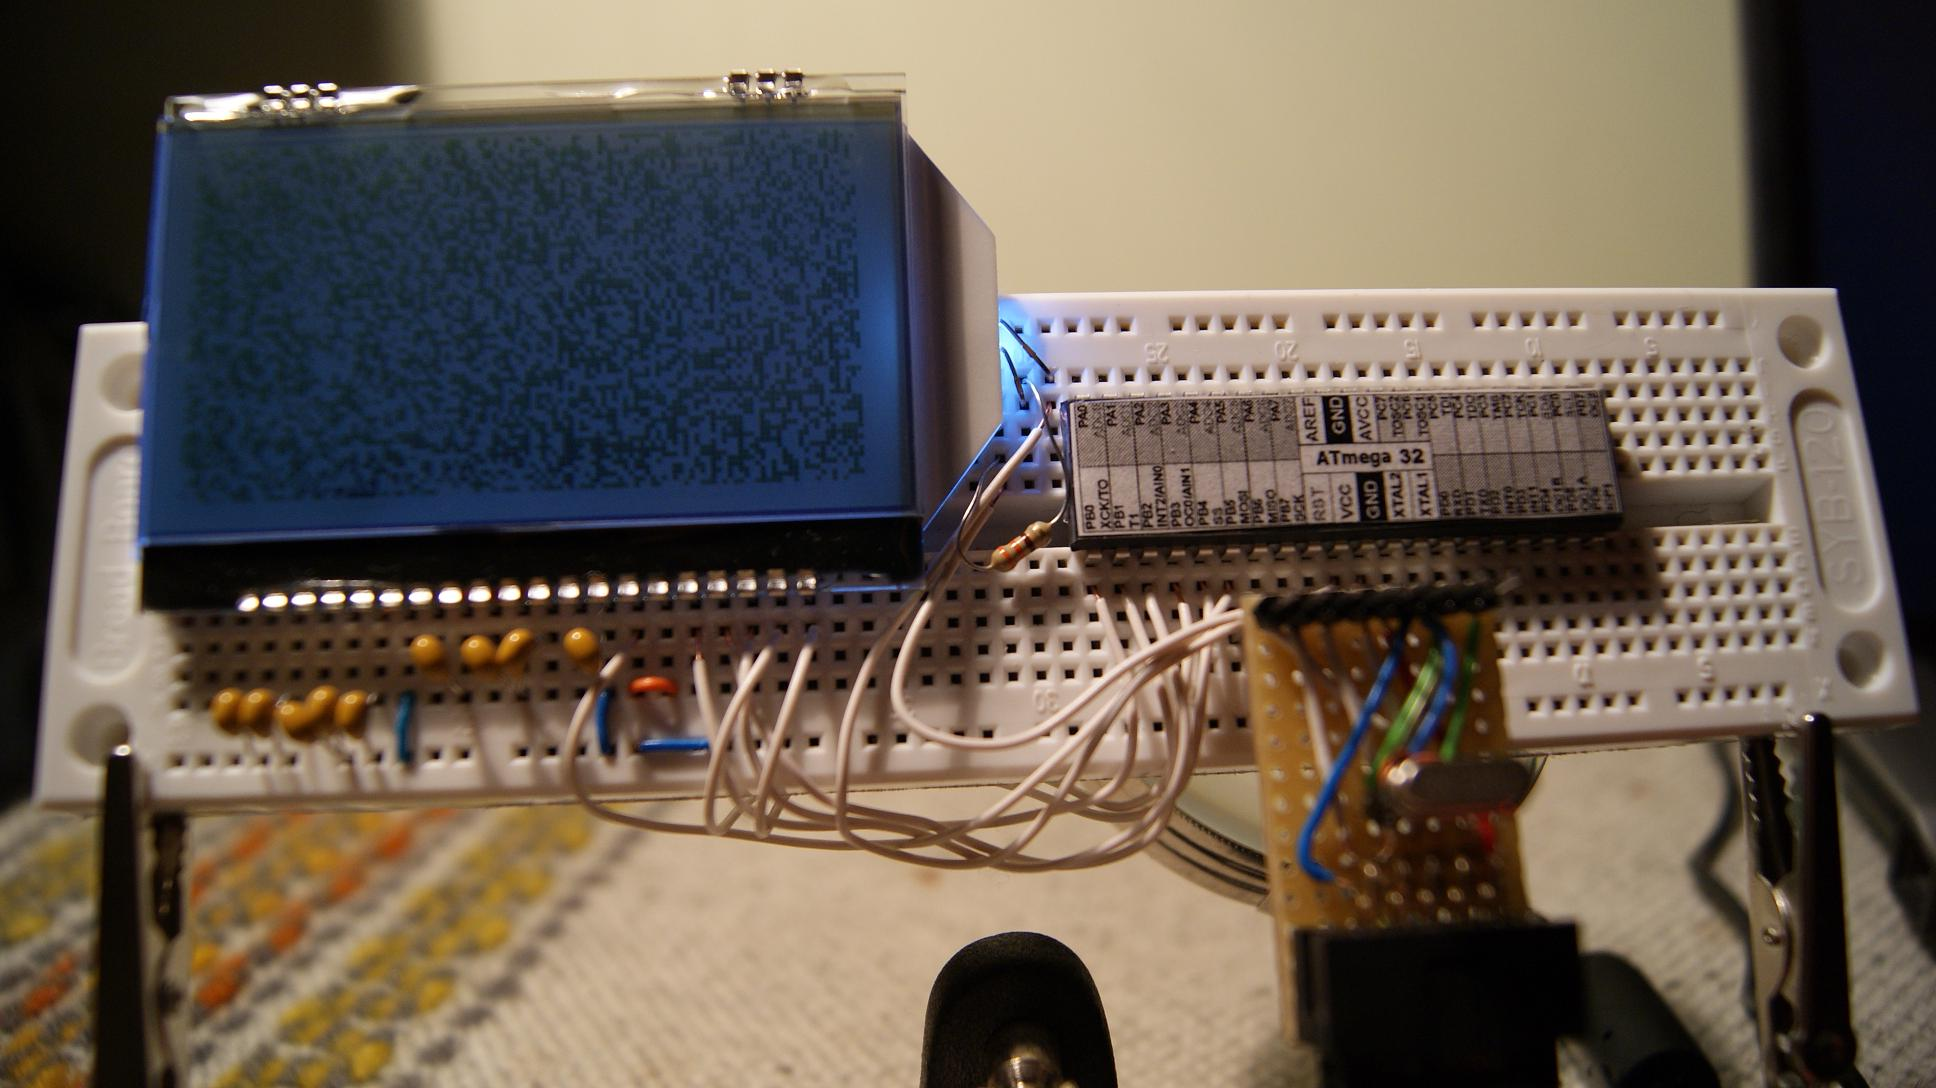 [Atmega32][c] - [ST7565] - Wy�wietlacz LCD-AG-C128064CF-FHW nie chce zadzia�a�